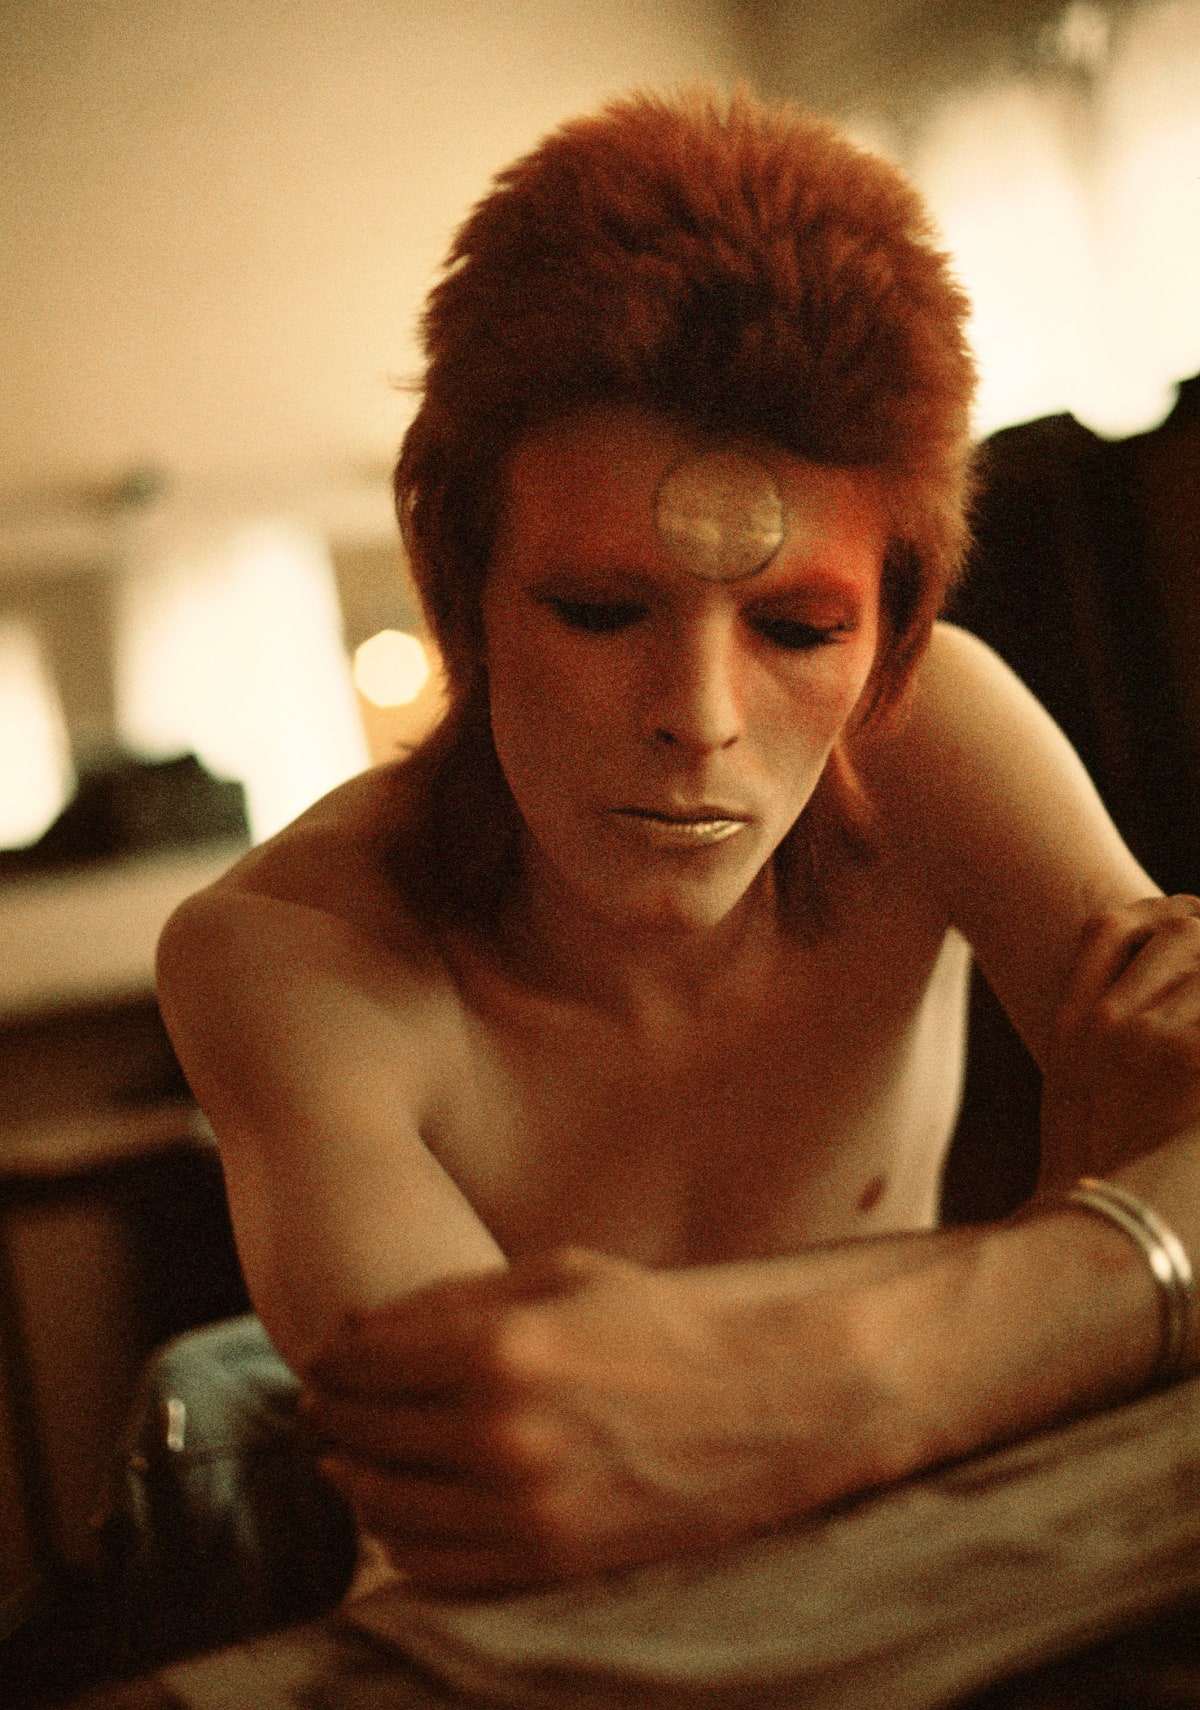 Geoff MacCormack, David Bowie: Hammersmith Odeon, London, 1973, 1973